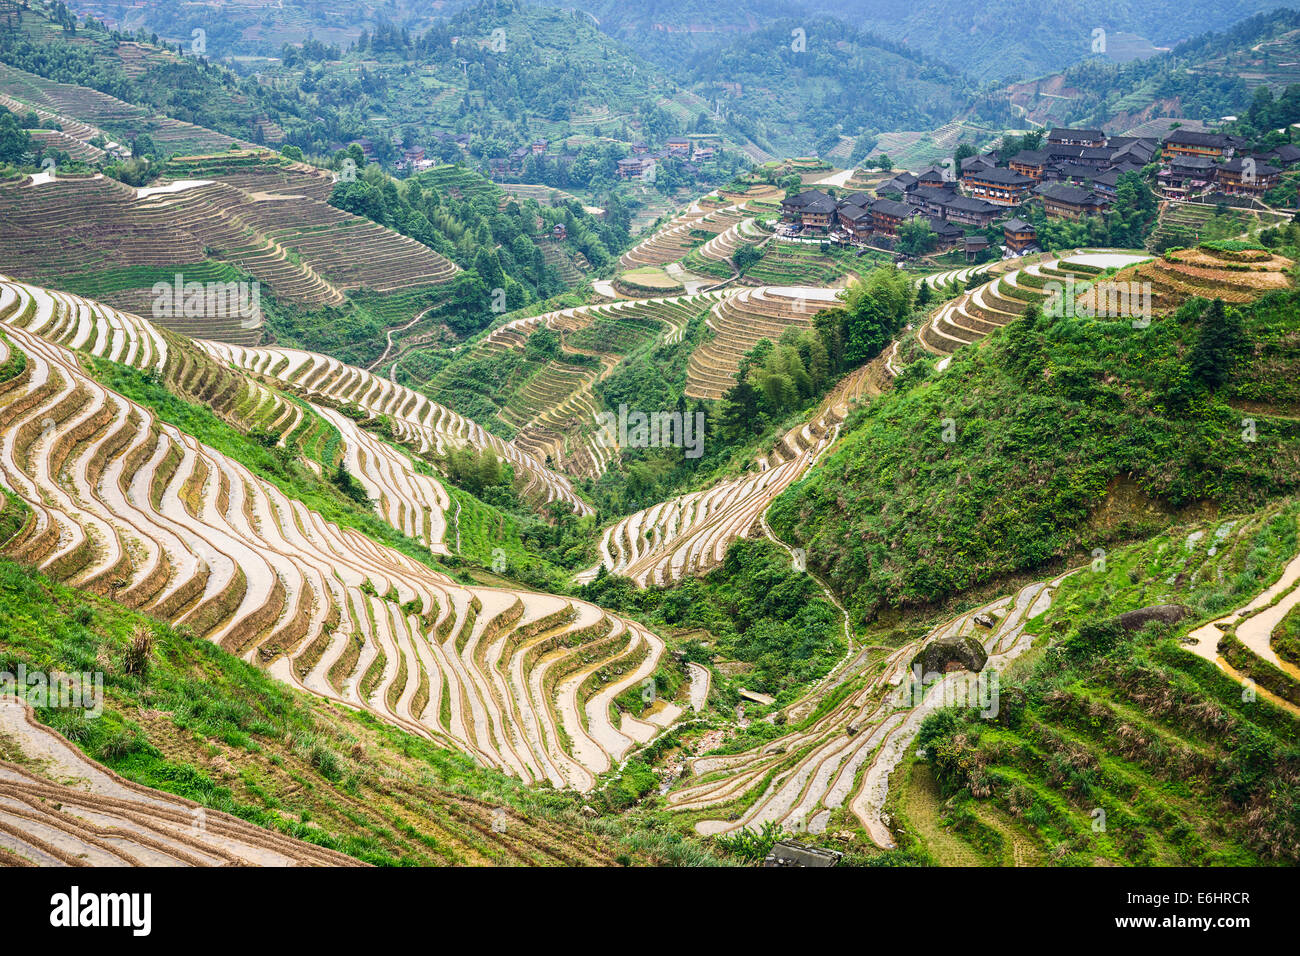 En la aldea de montaña Yaoshan en Guangxi, China. Imagen De Stock